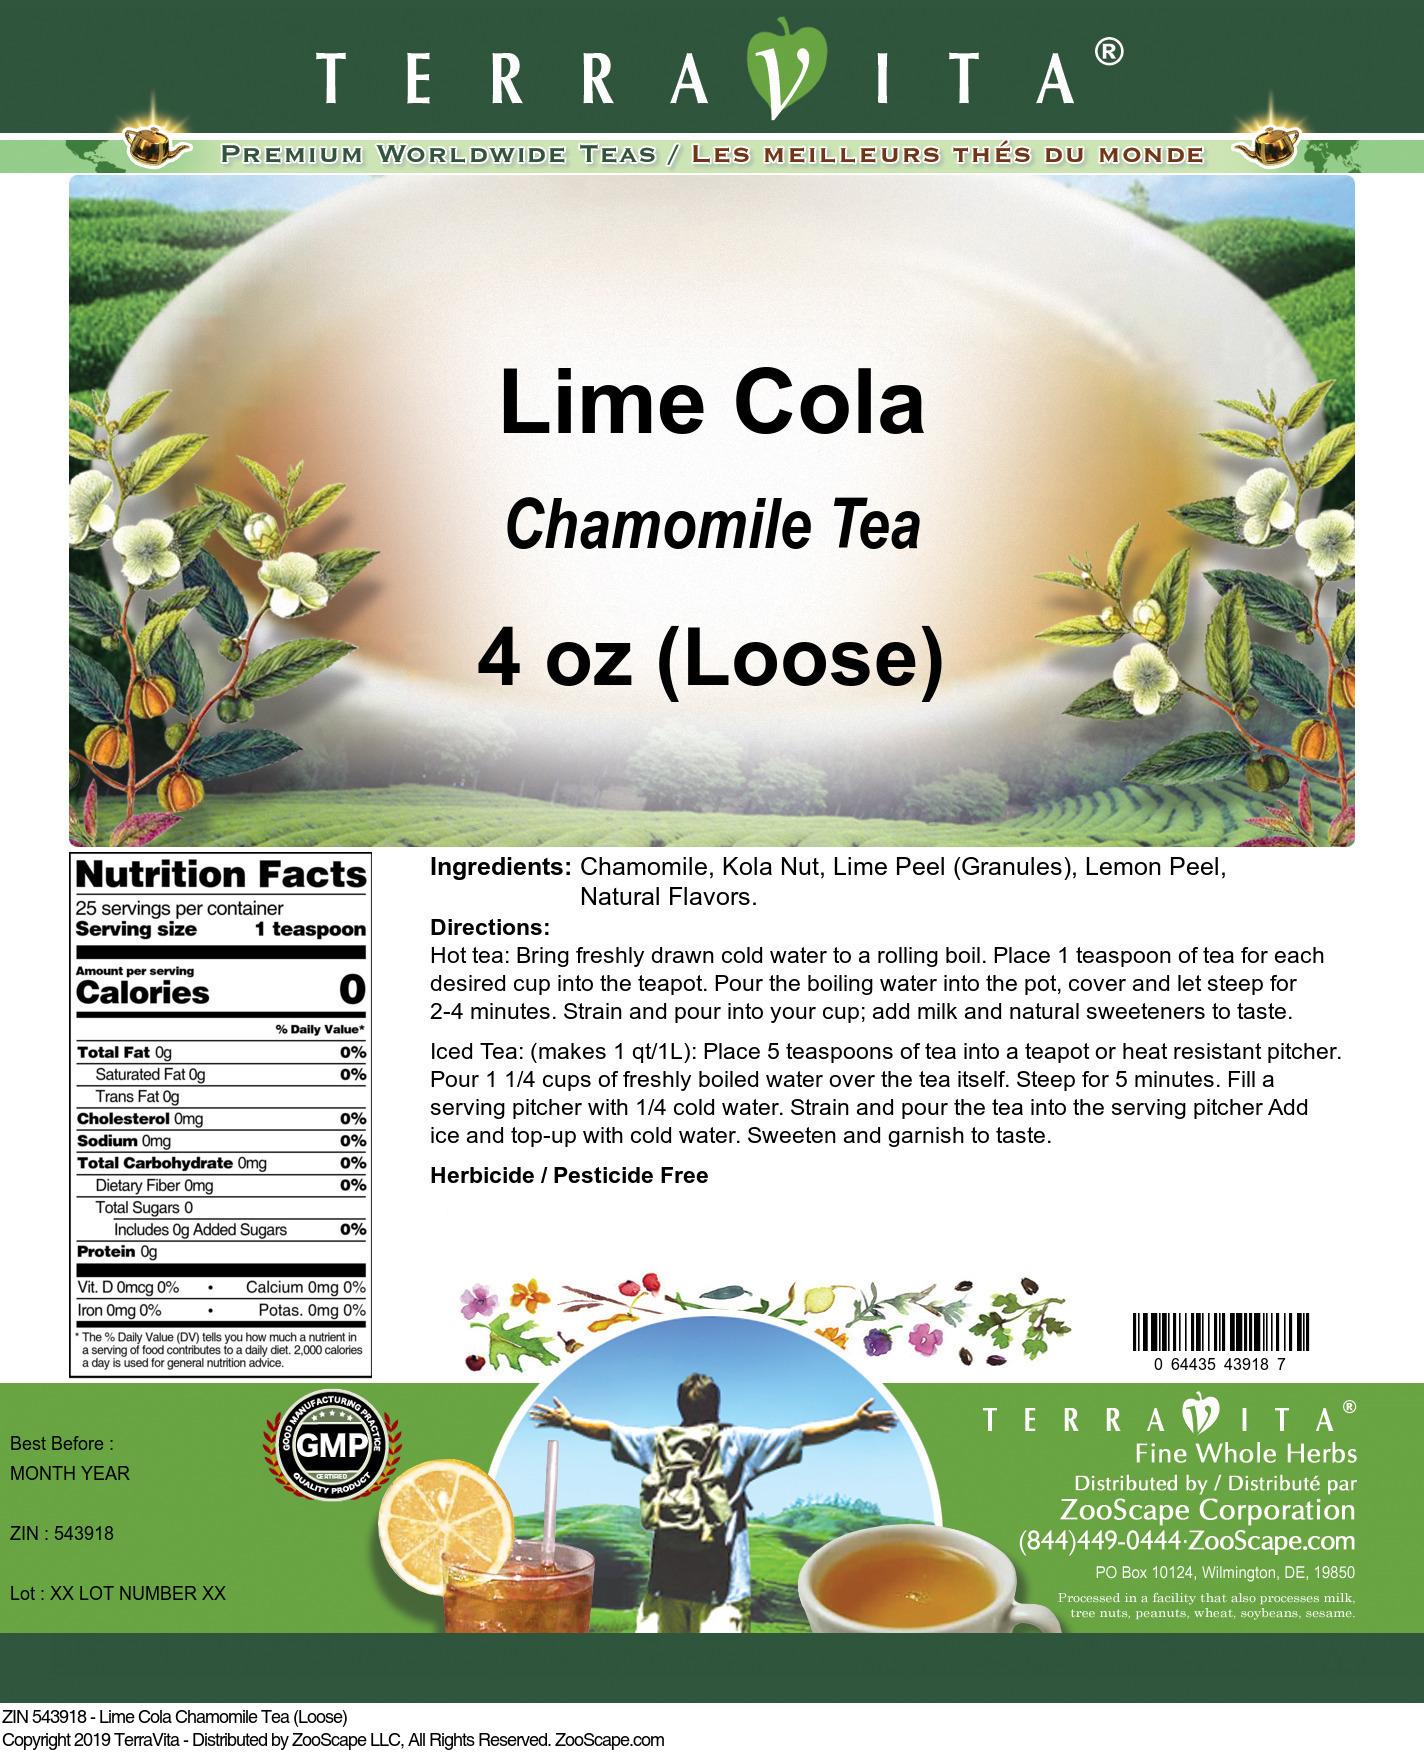 Lime Cola Chamomile Tea